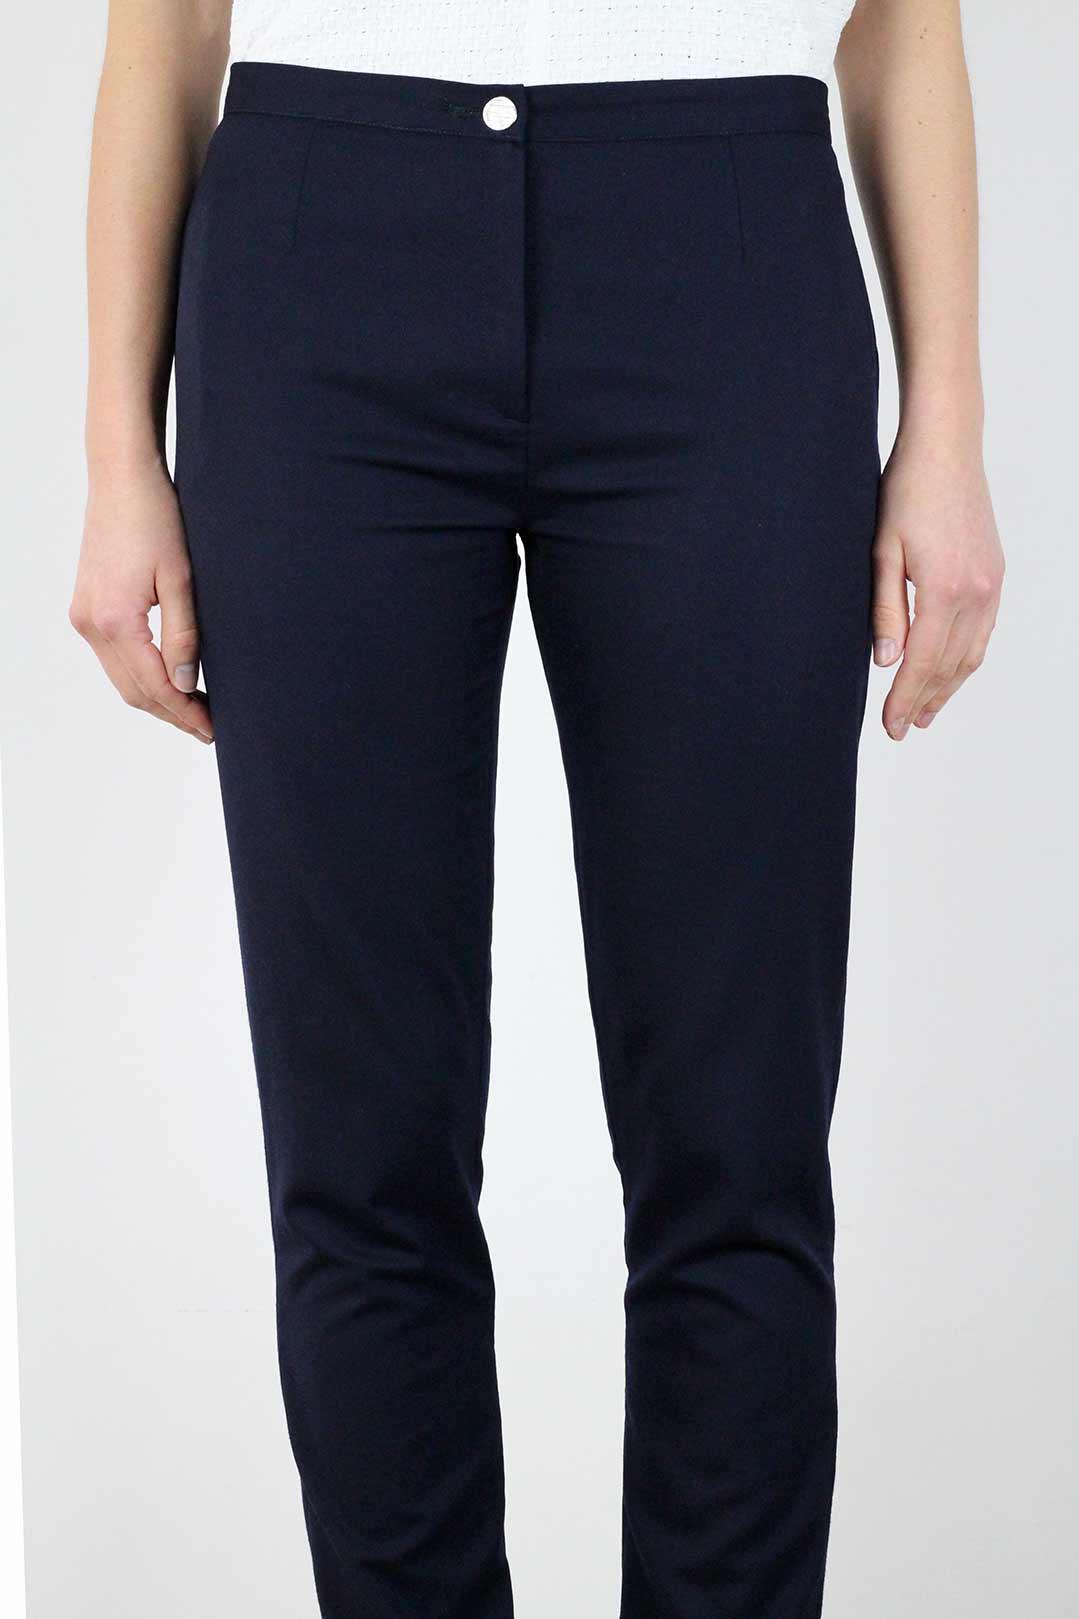 pantalon femme best set with pantalon femme pantalon. Black Bedroom Furniture Sets. Home Design Ideas